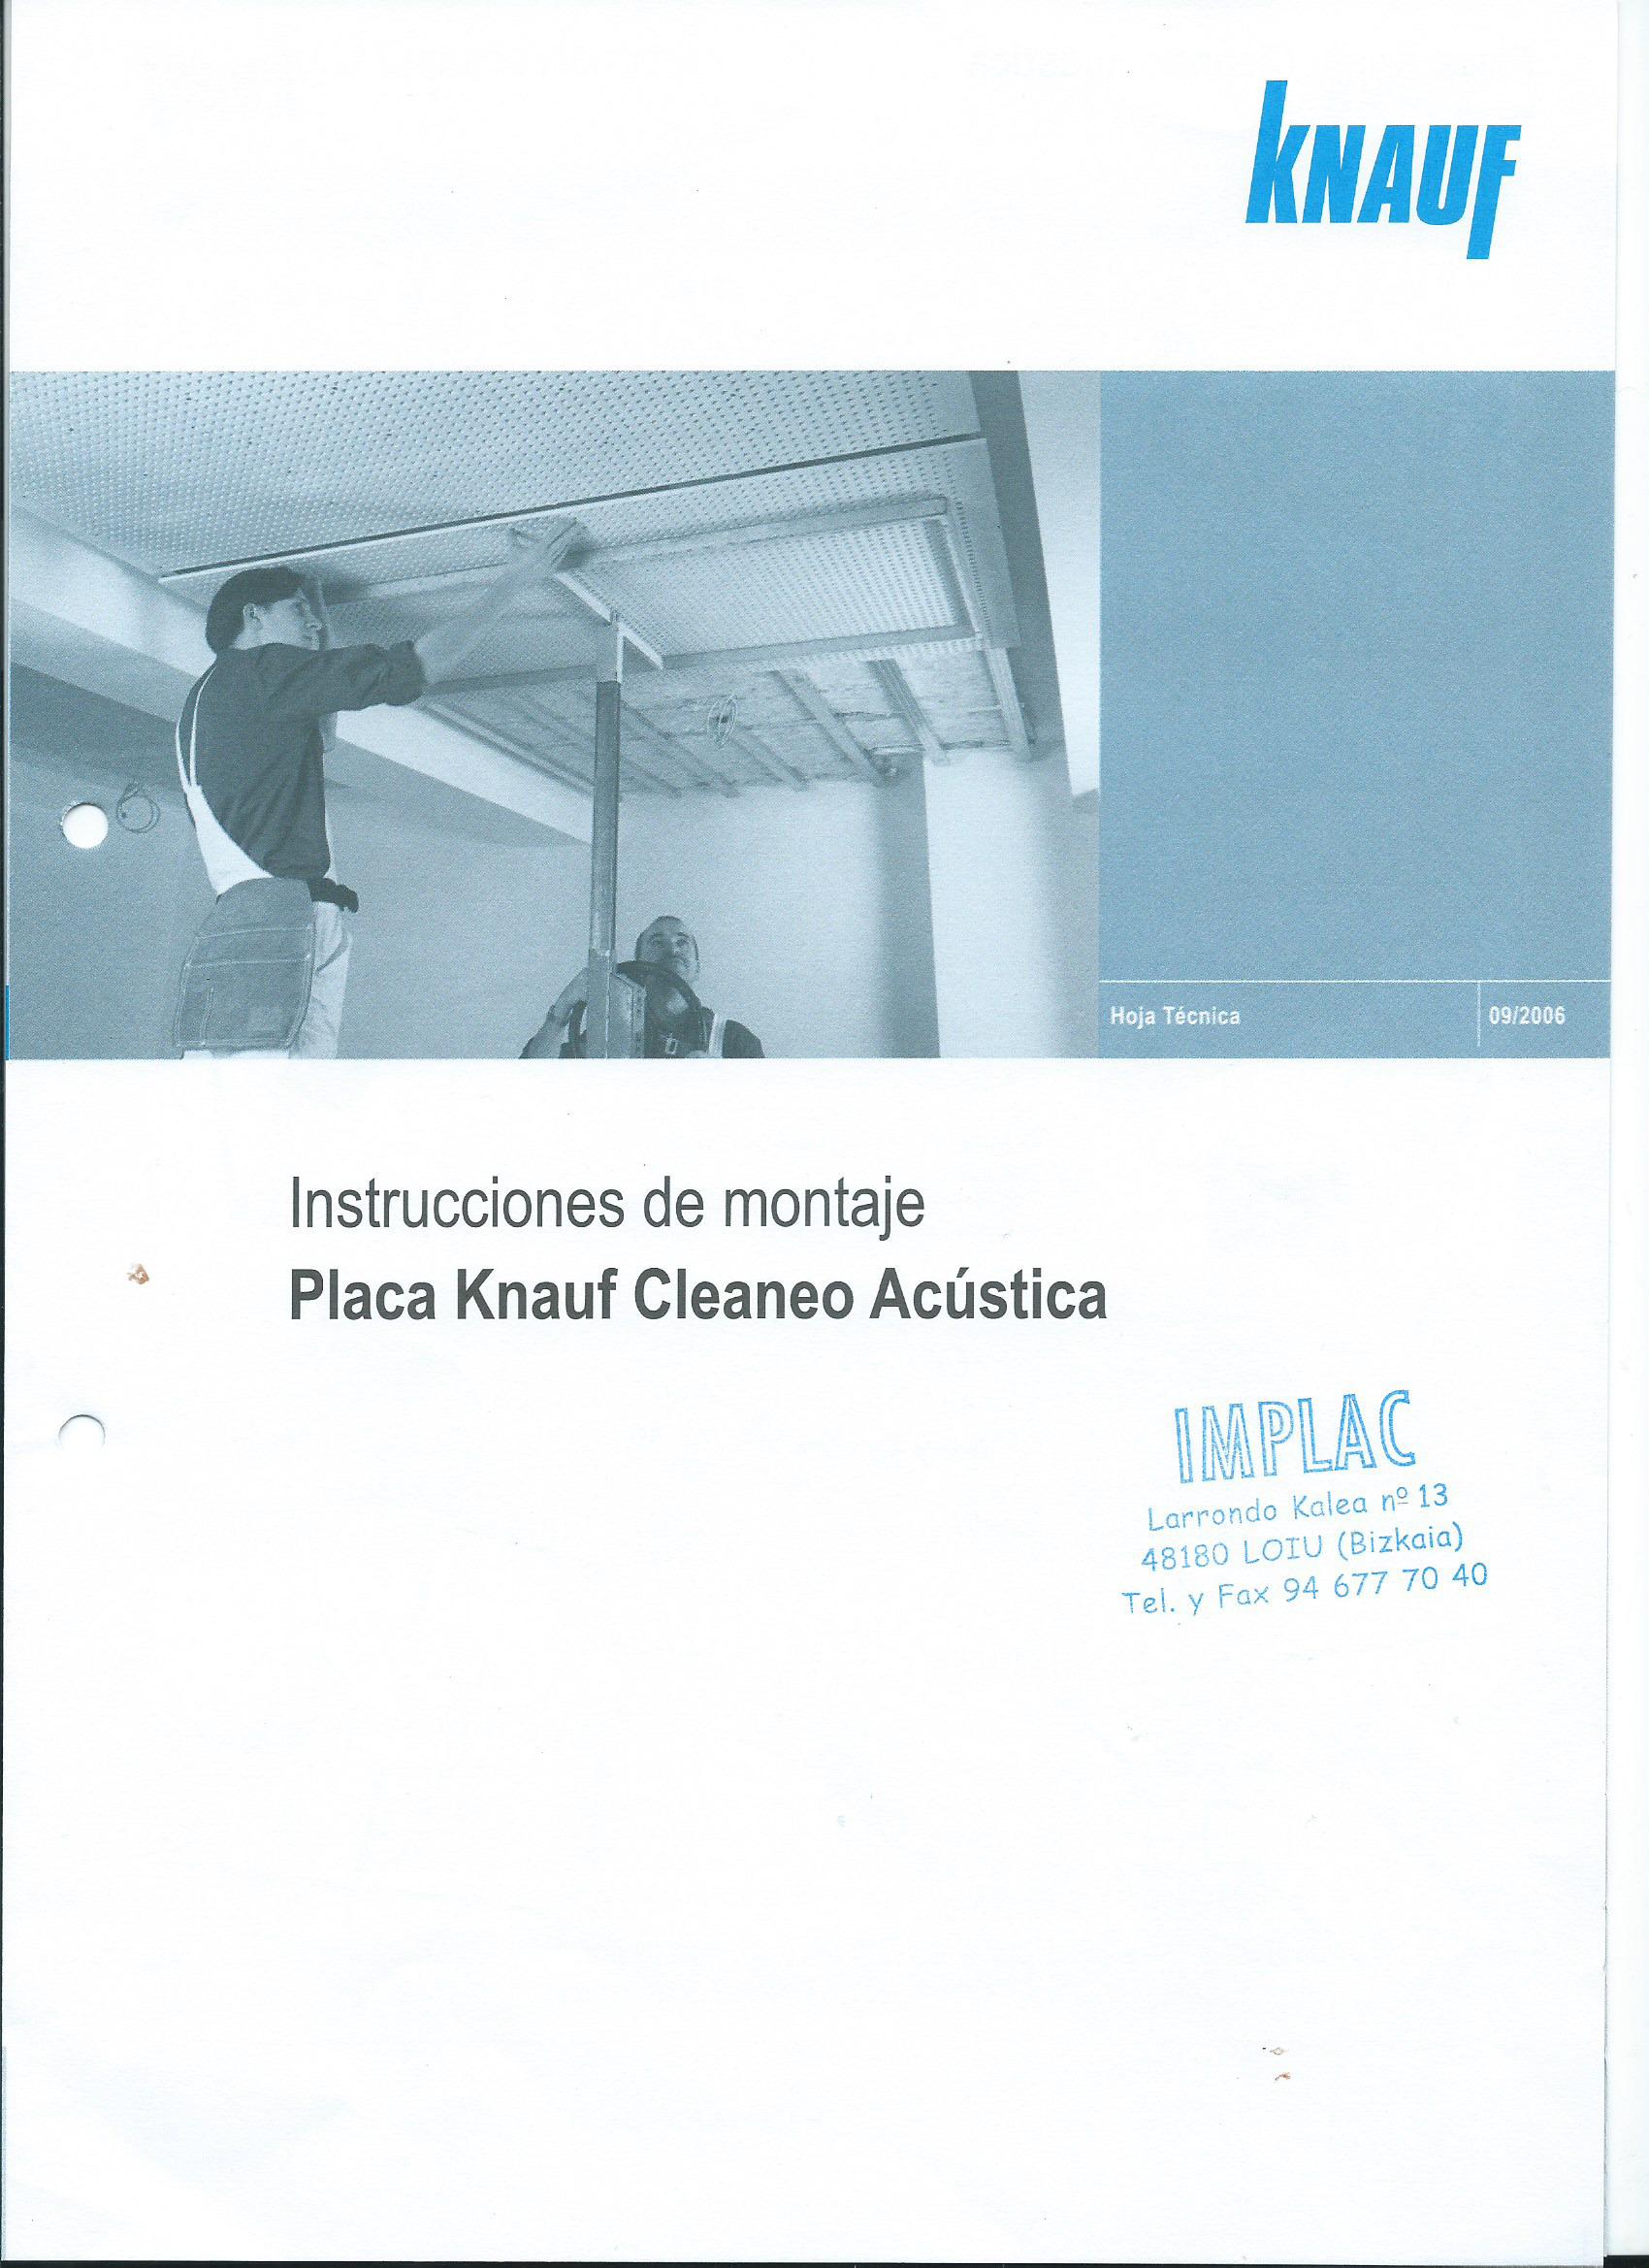 Placa-Knauf-Cleaneo-Acústica.jpg